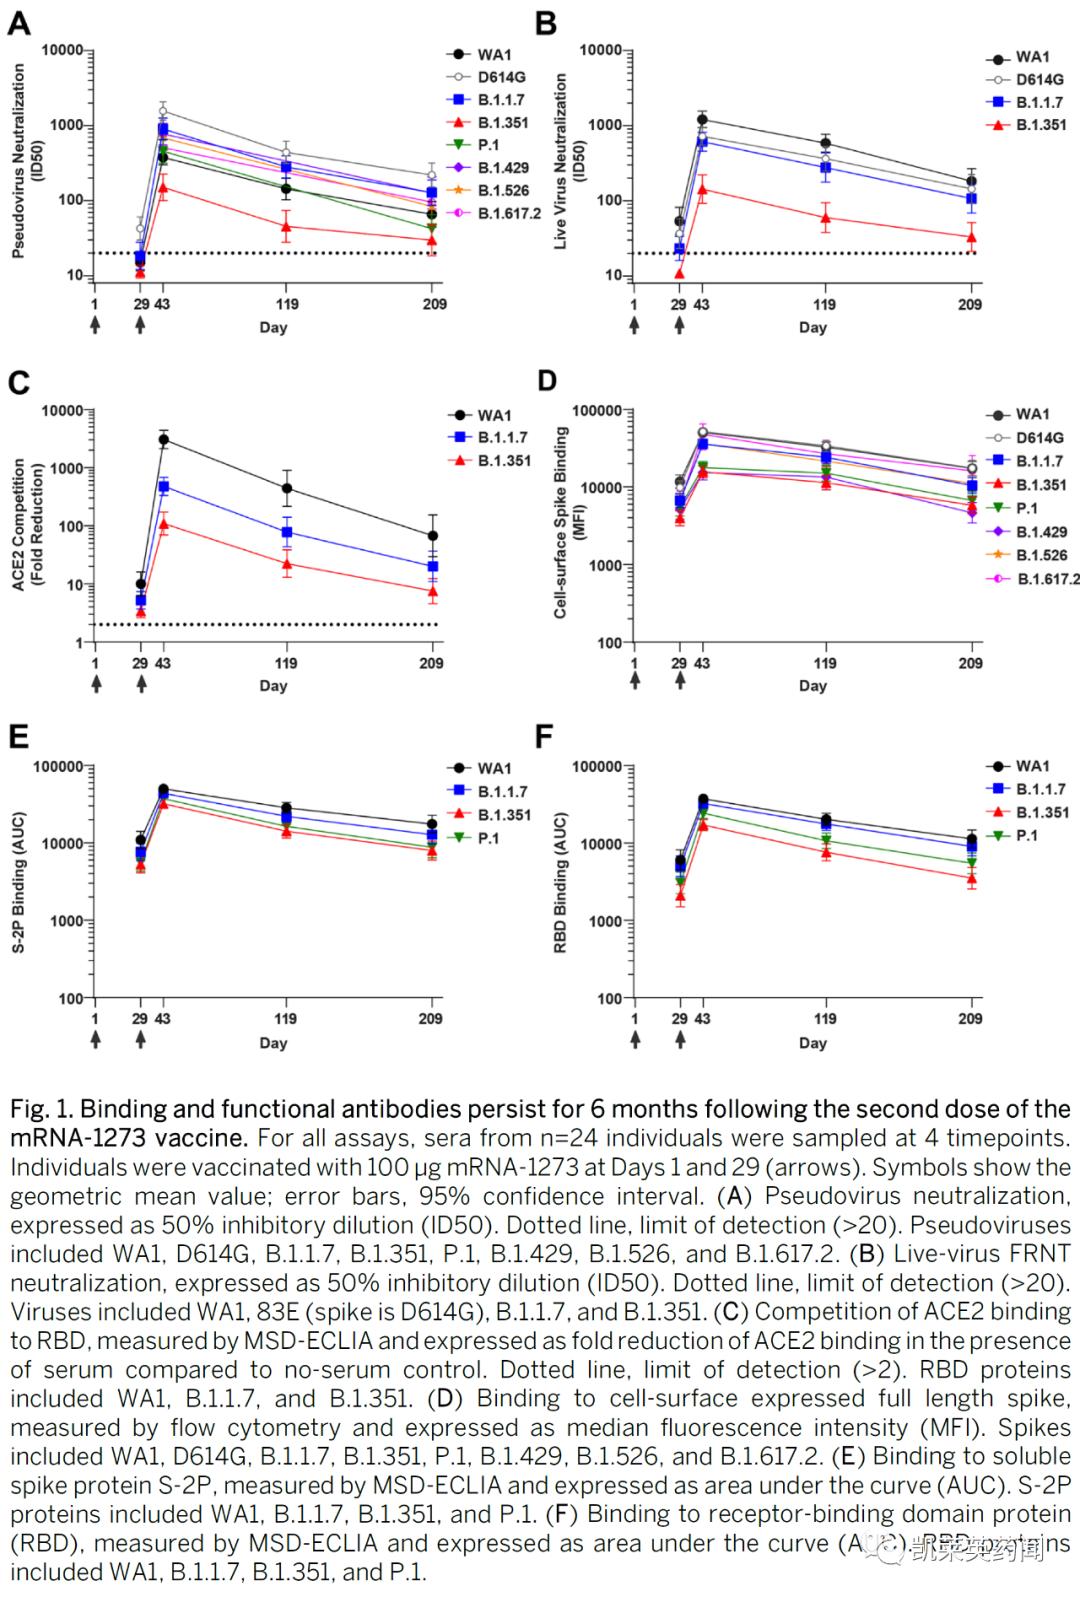 Science公布Moderna新冠mRNA疫苗针对不同变异毒株效力详细数据,保护效力最差的不是delta